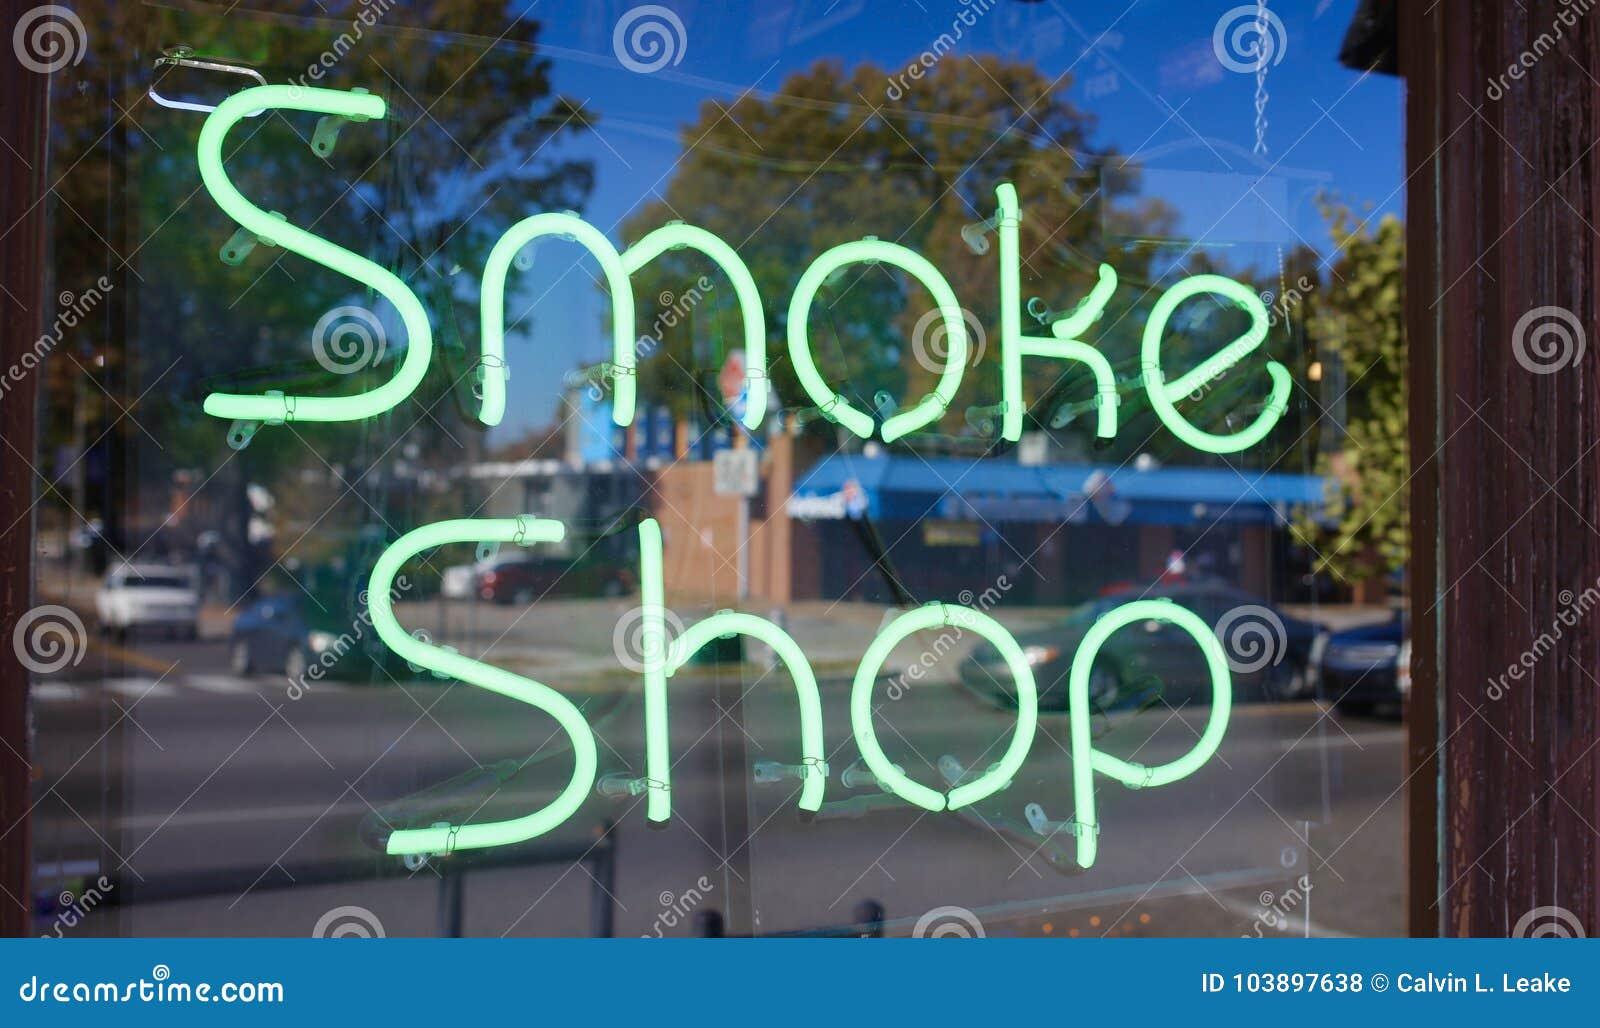 Download Cigarettes, Cigars And E-Cig Shop Stock Photo - Image of memphis, leaf: 103897638